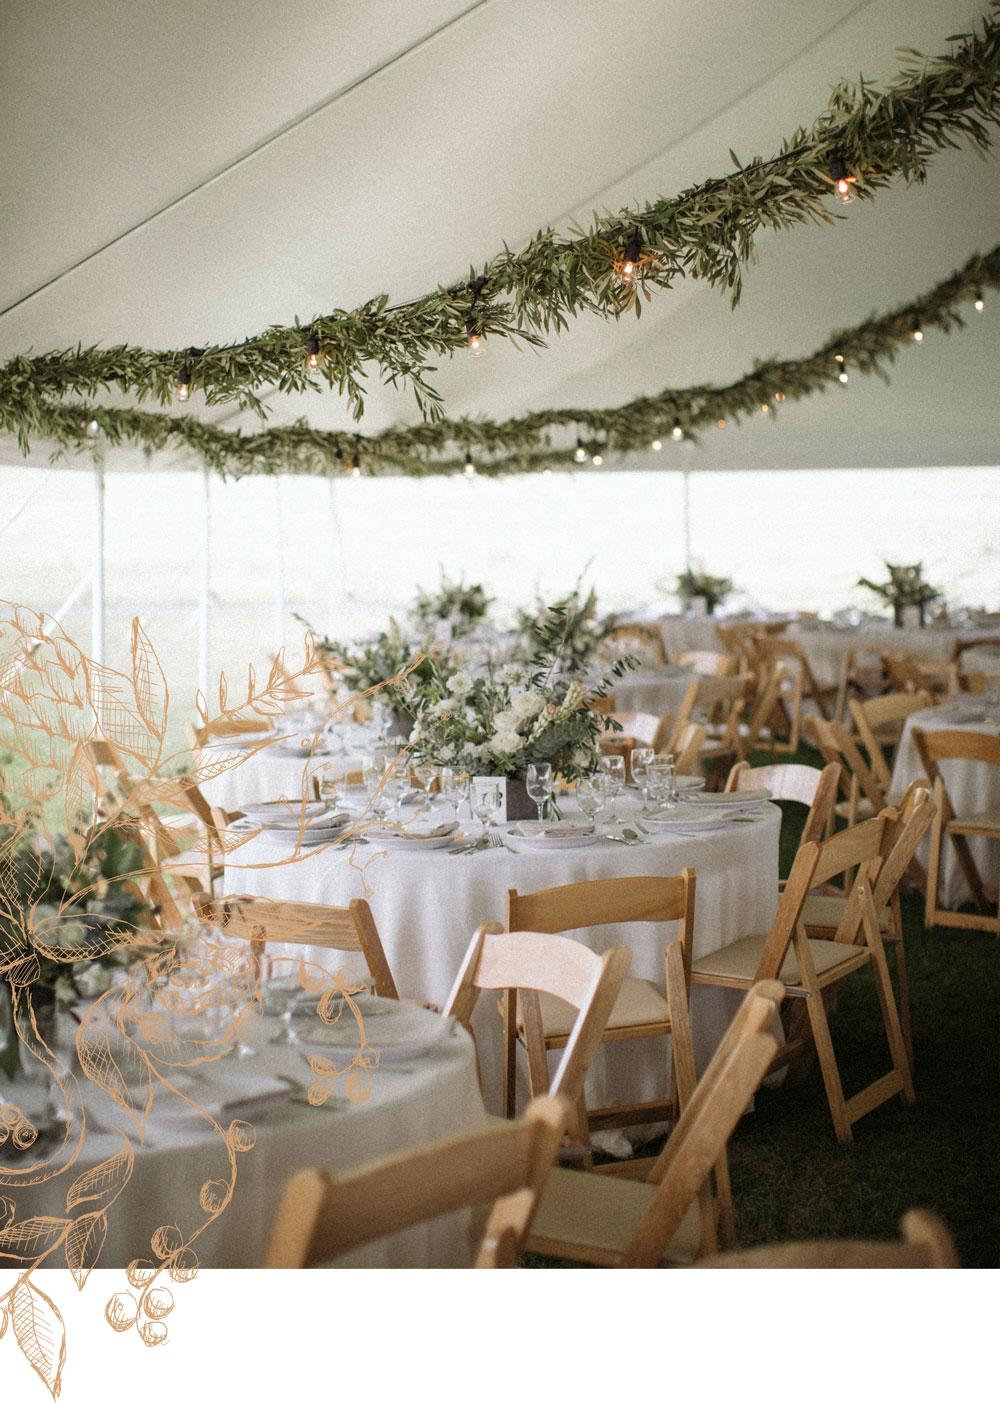 Botanical-Overlay-Jenna-Jared-cherry-basket-farms.jpg